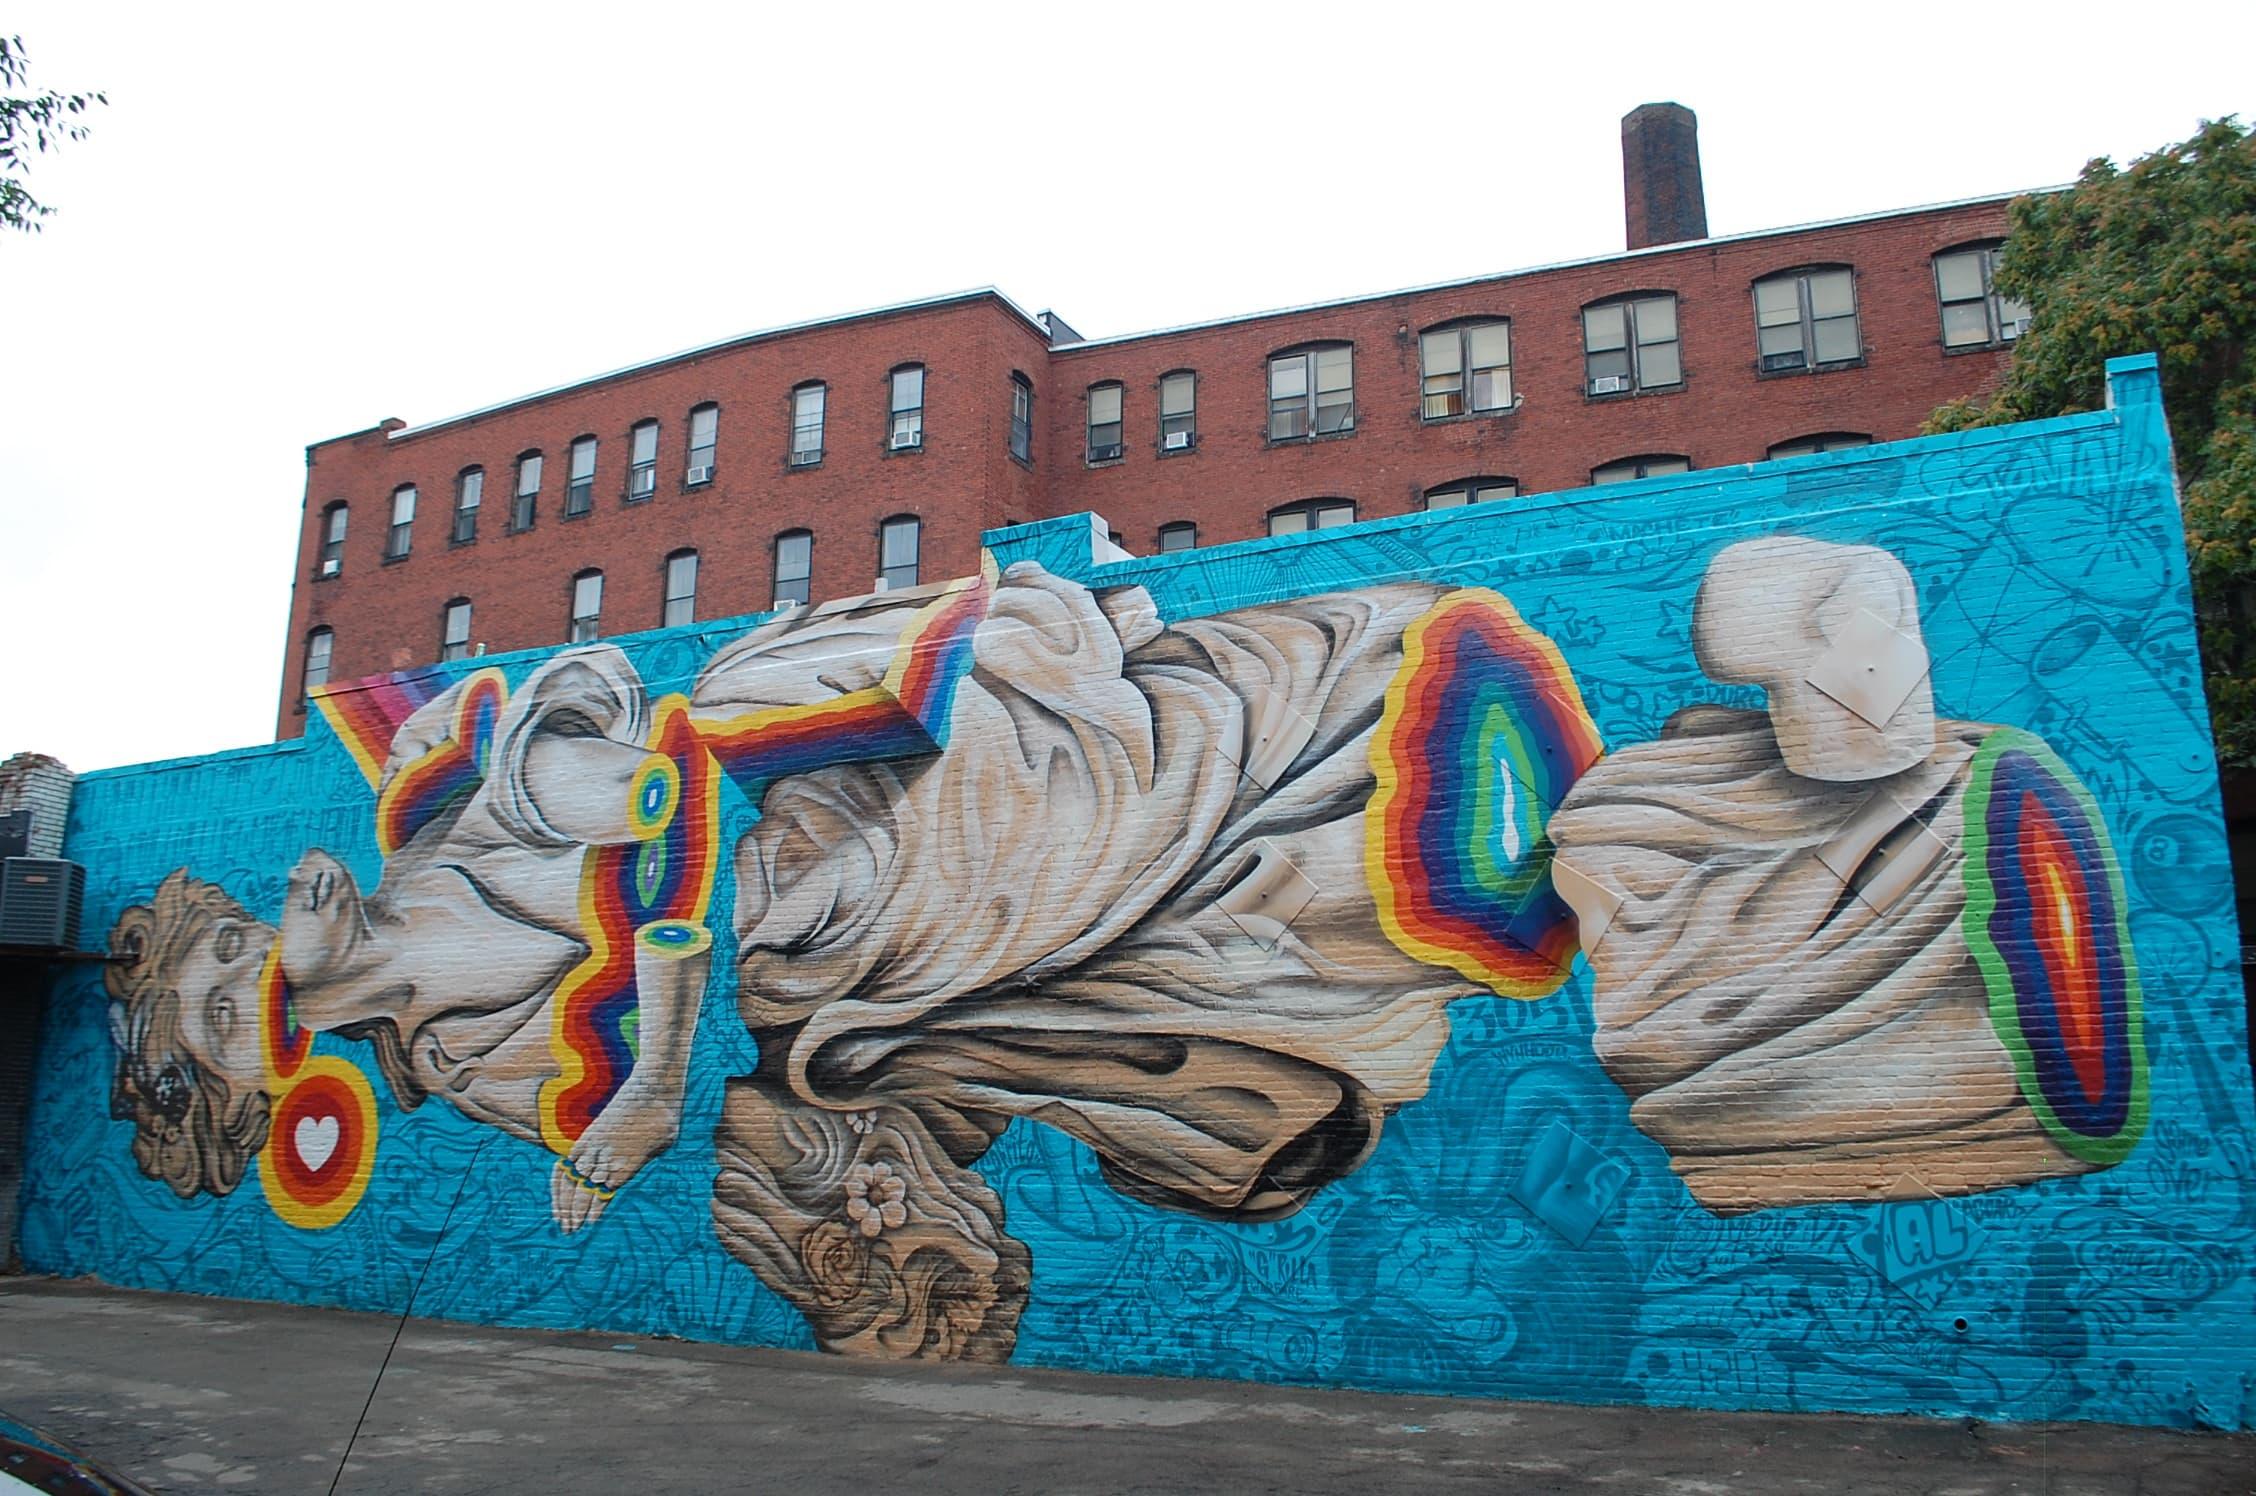 Our Favorite Street Art From Lynn S Beyond Walls Mural Festival